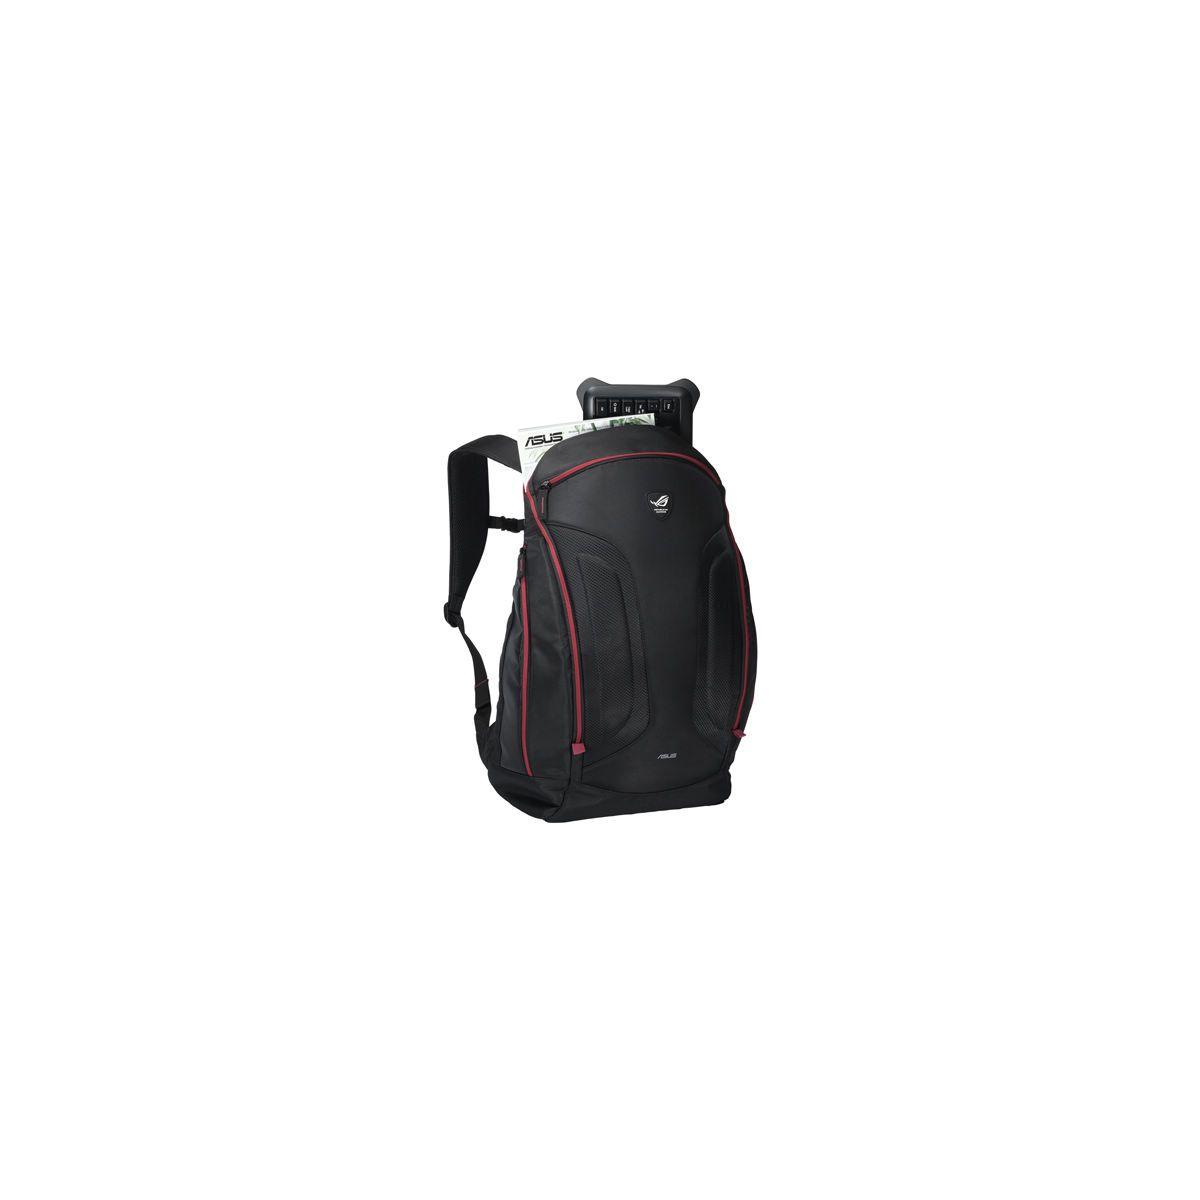 Sac � dos asus shuttle 2 backpack 17'' noir